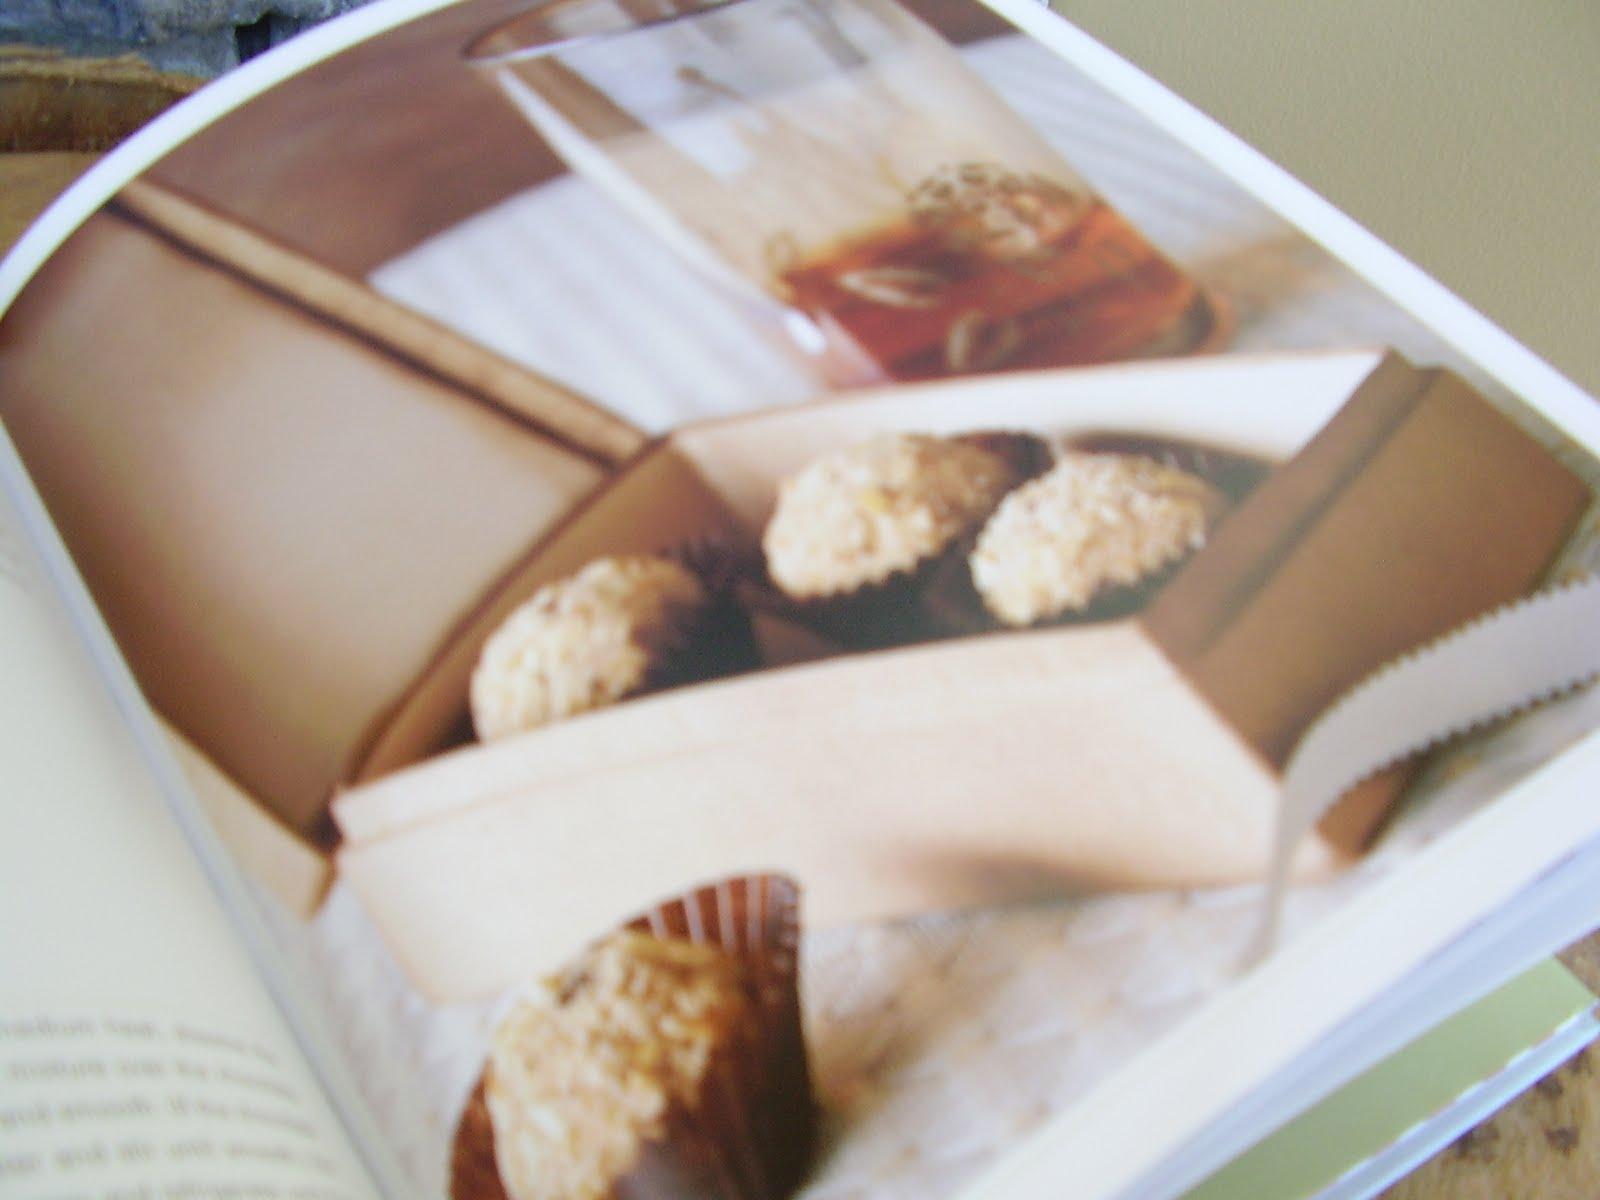 Like Mocha-Hazelnut Truffles, from the Brittles, Barks, & Bonbons book ...